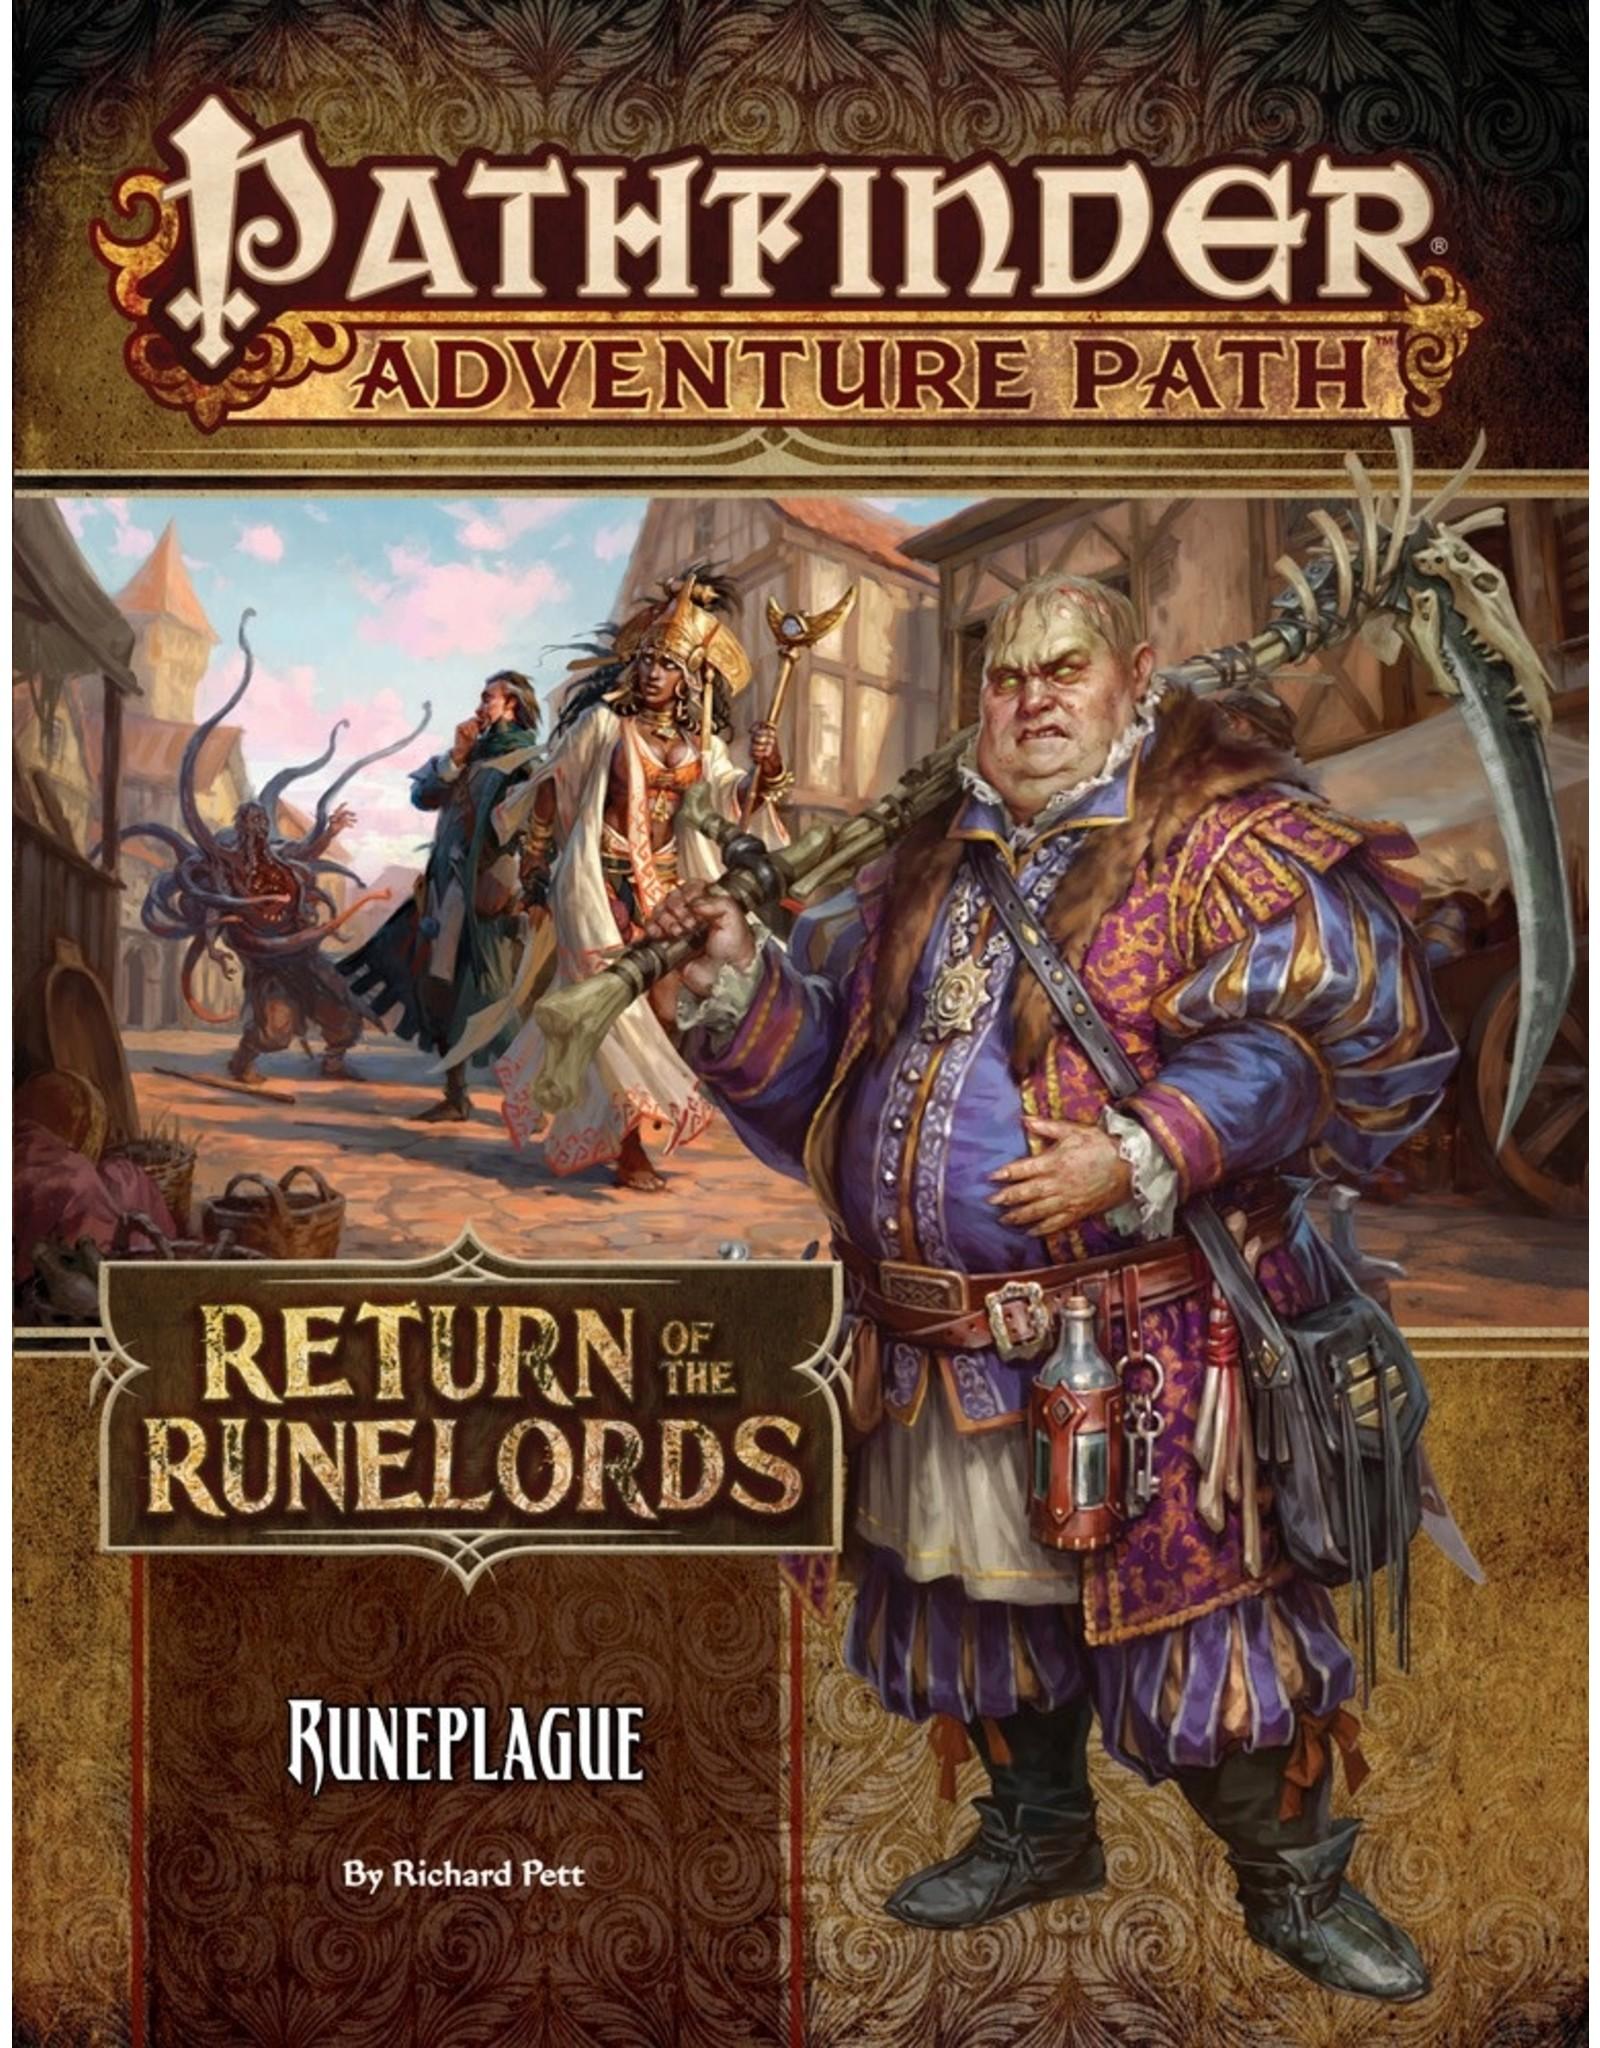 Pathfinder RPG Adventure Path #135 Return of the Runelords: Runeplague